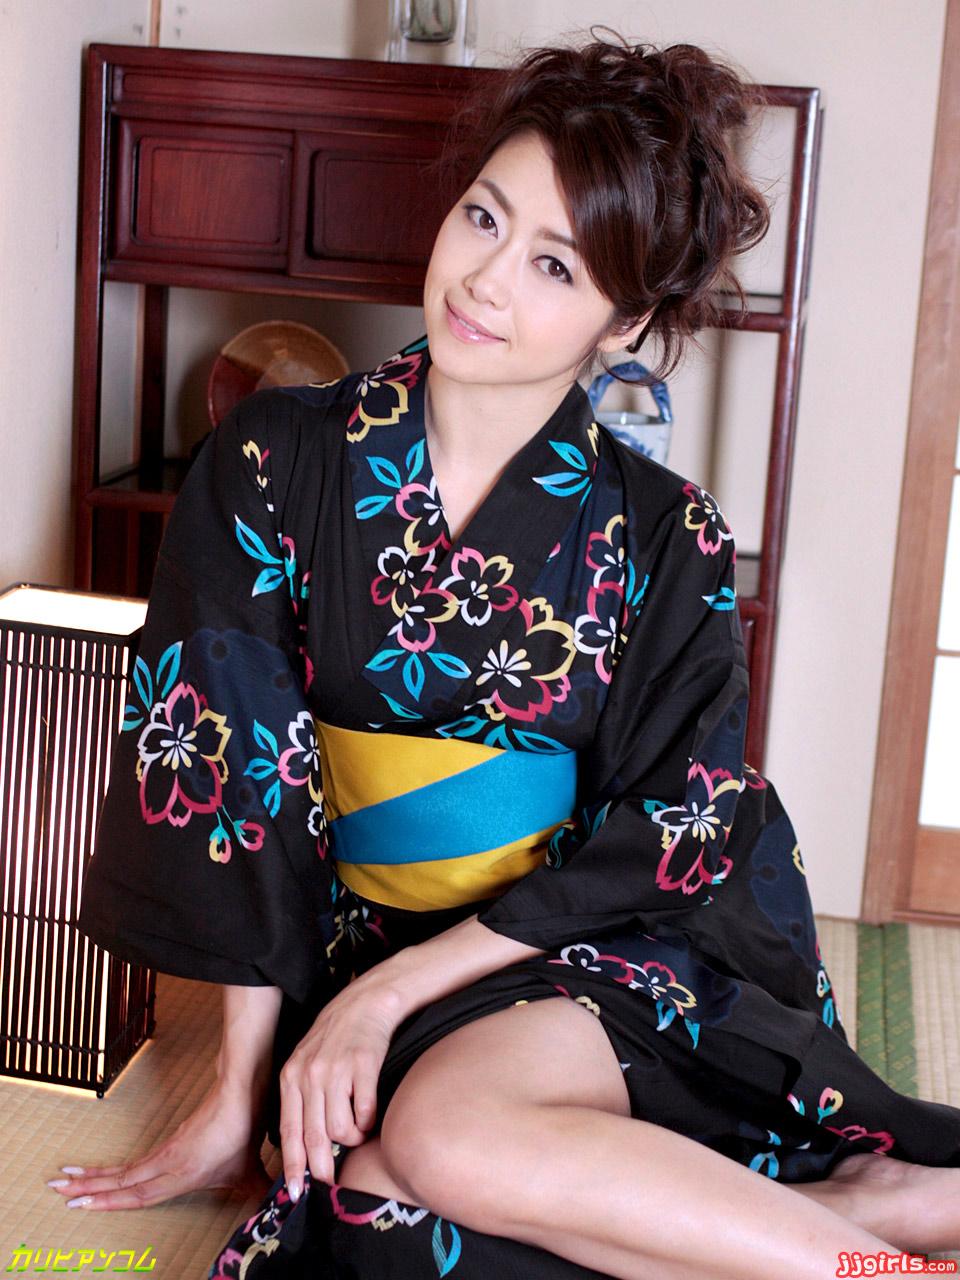 Maki Hojo - Album 46 - 2